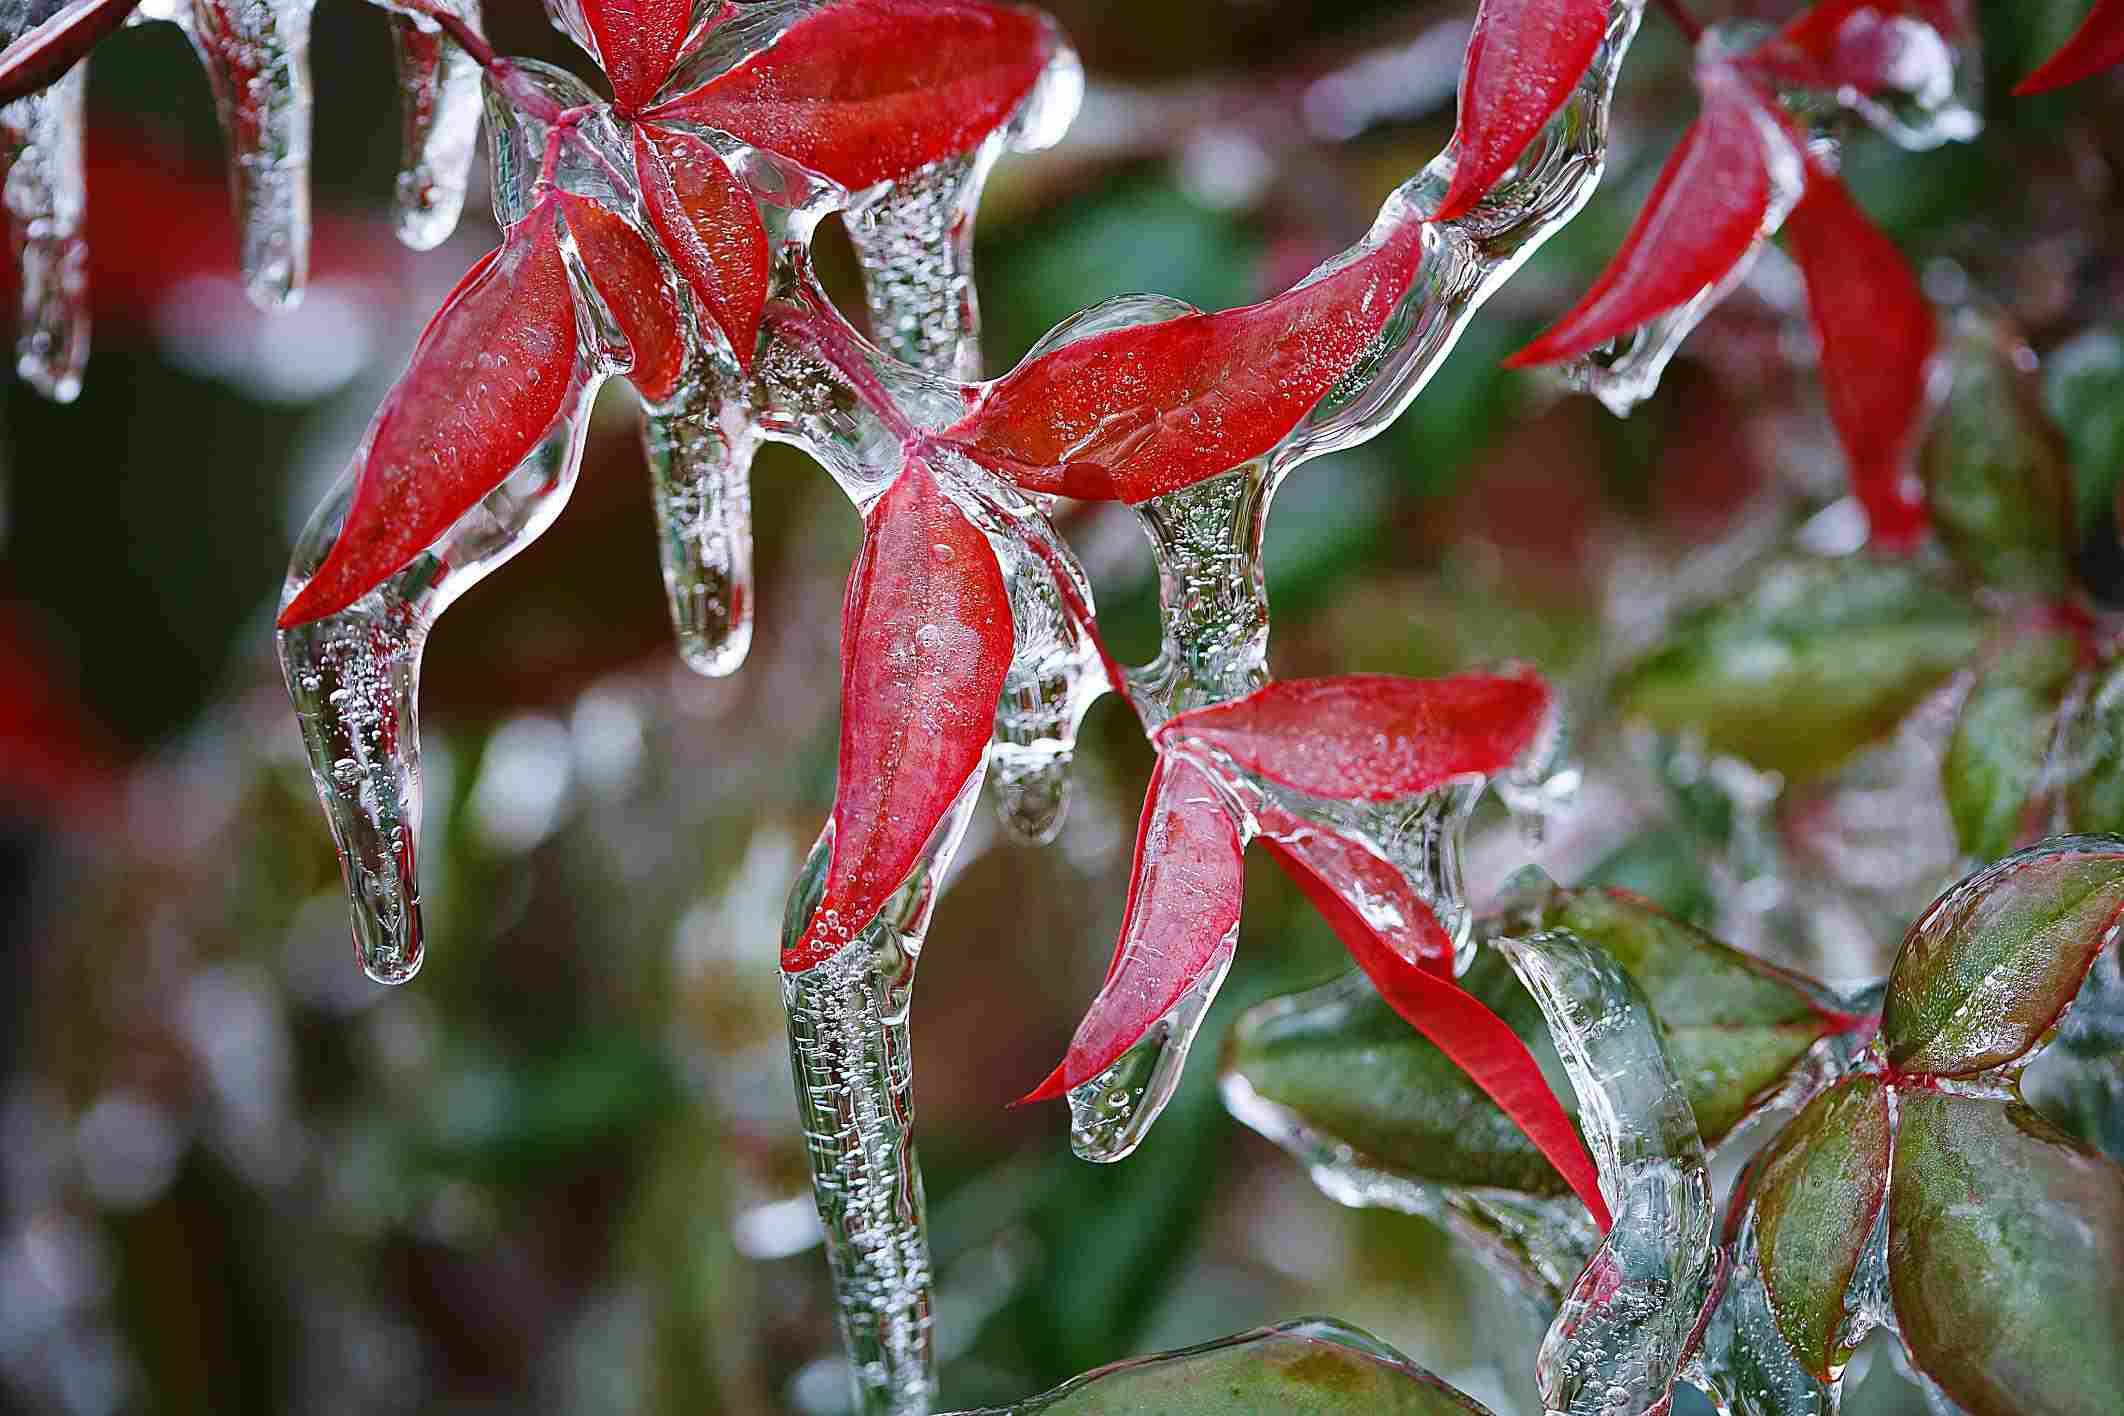 Rain Snow Sleet And Other Types Of Precipitation